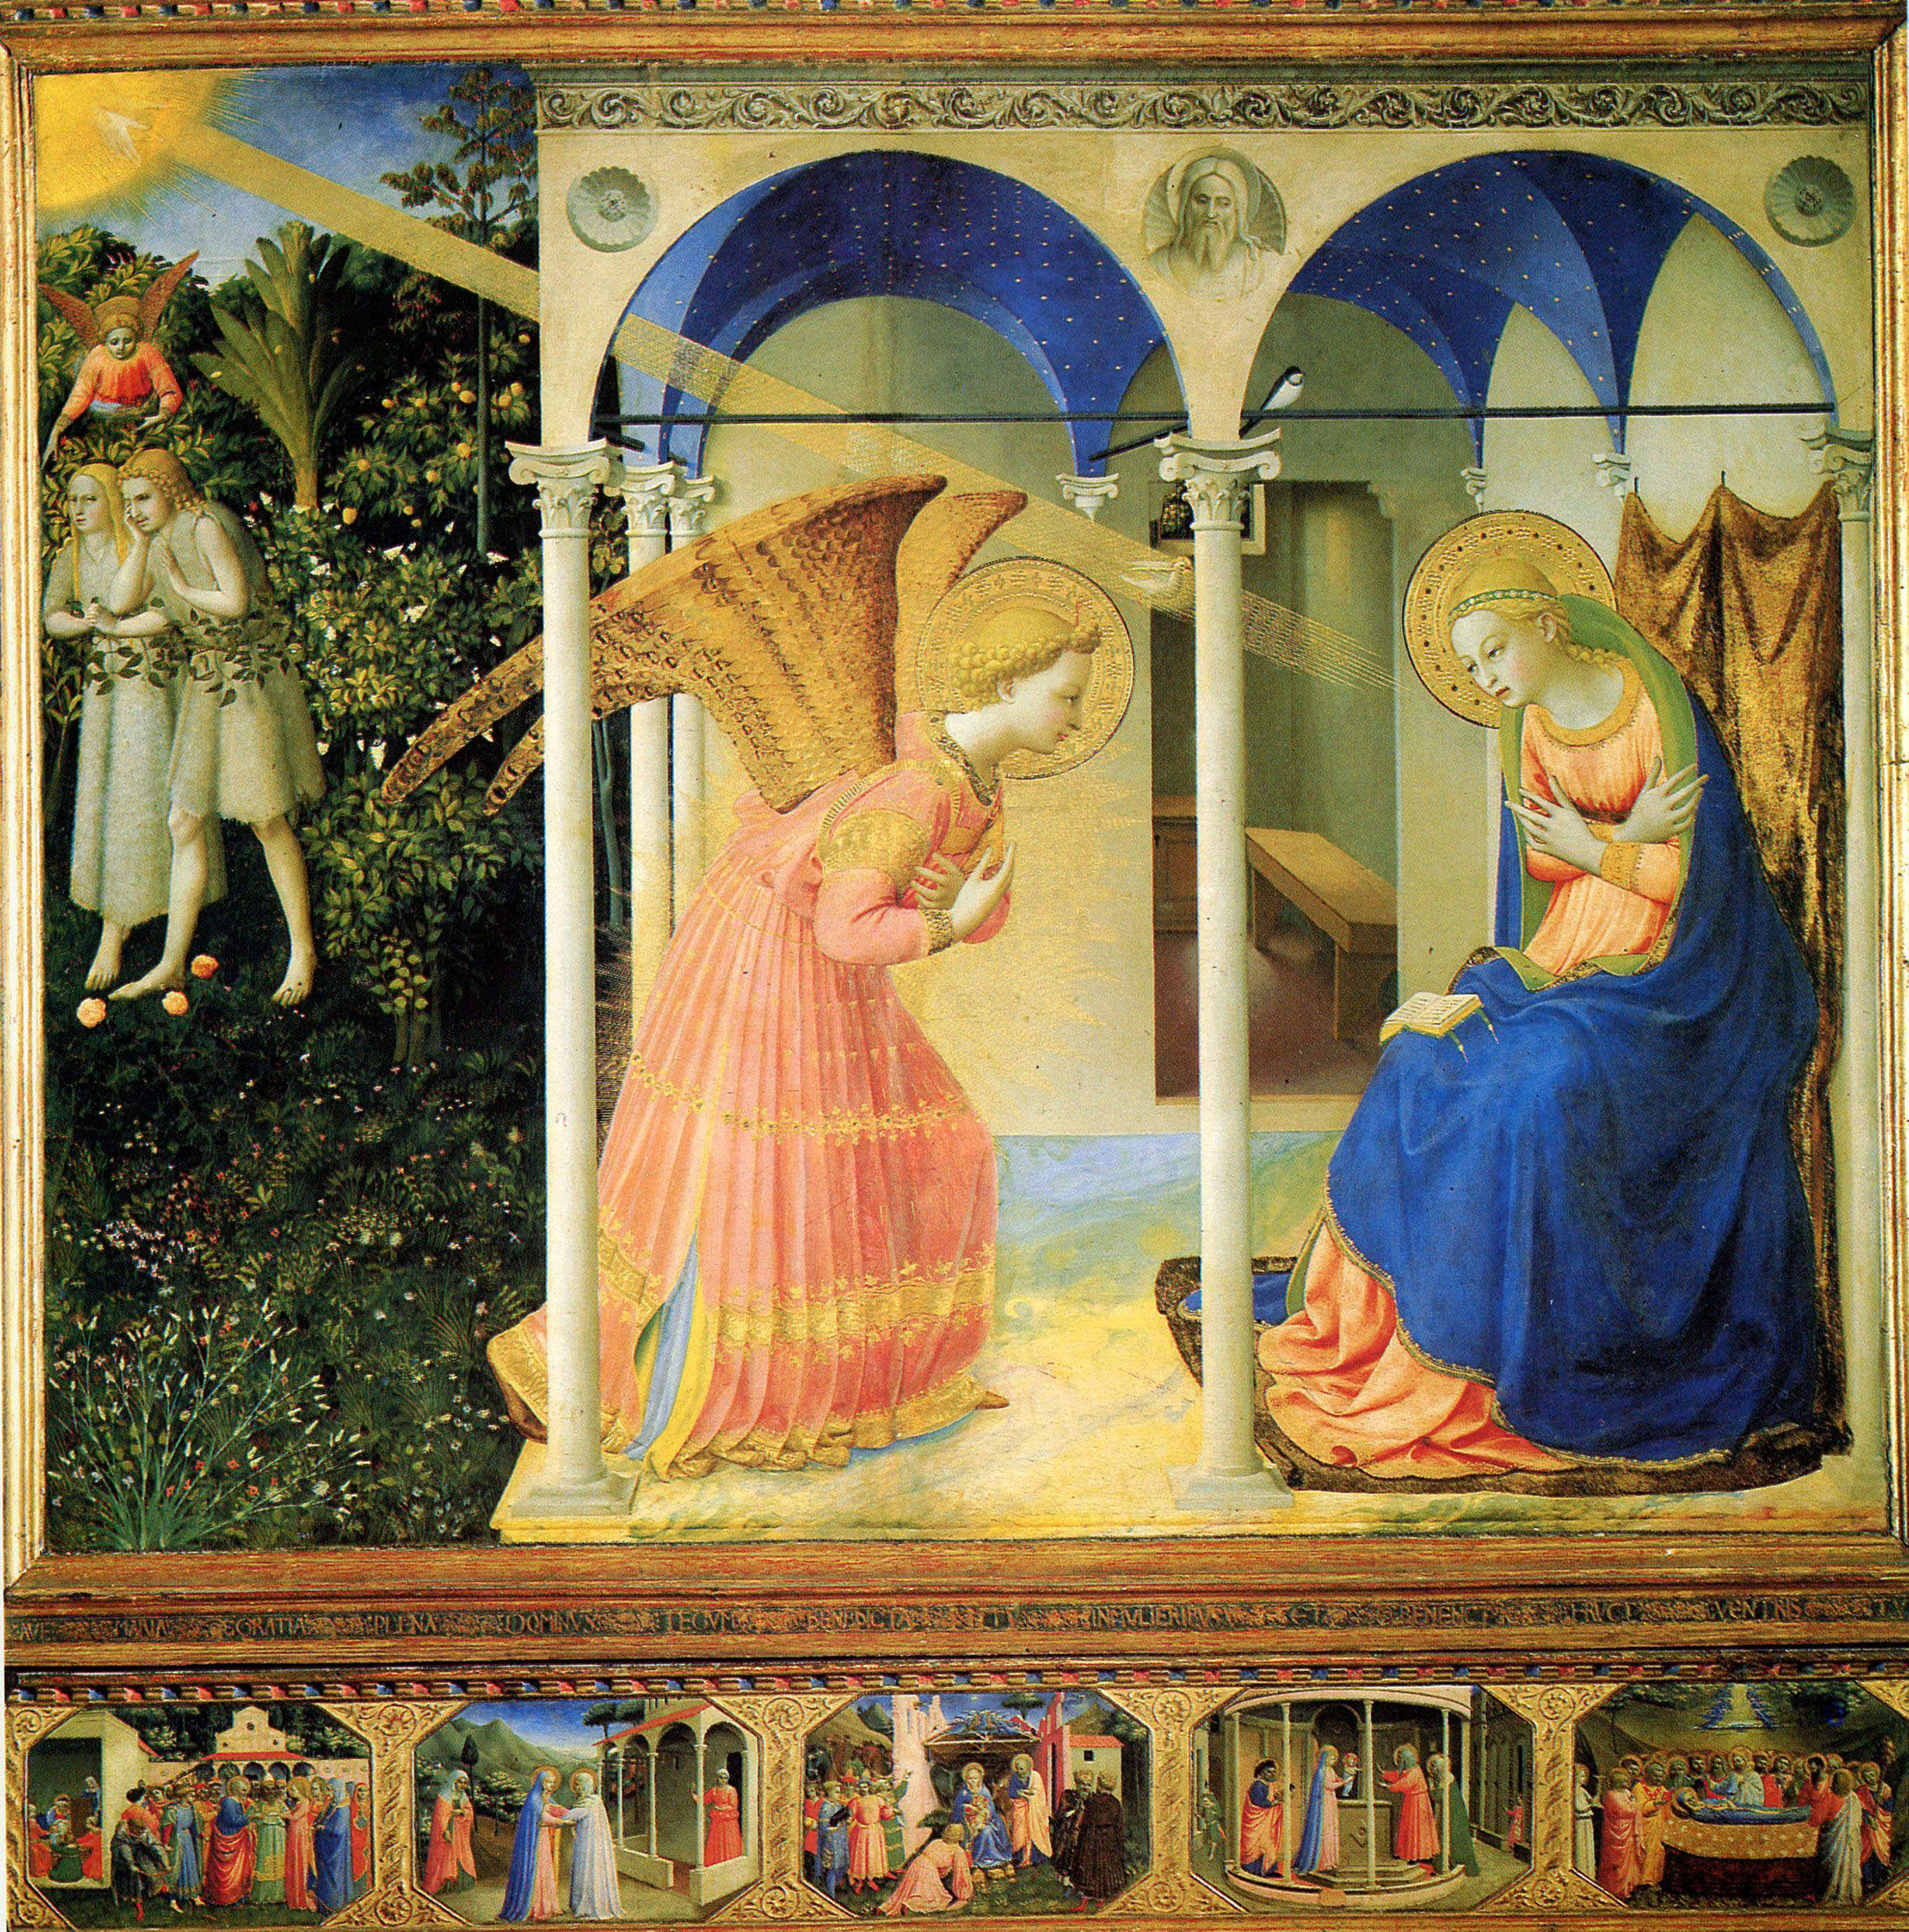 Fra Angelico, annonciation, vers 1430, det rempe sur bois, 194x194, Prado, Madrid